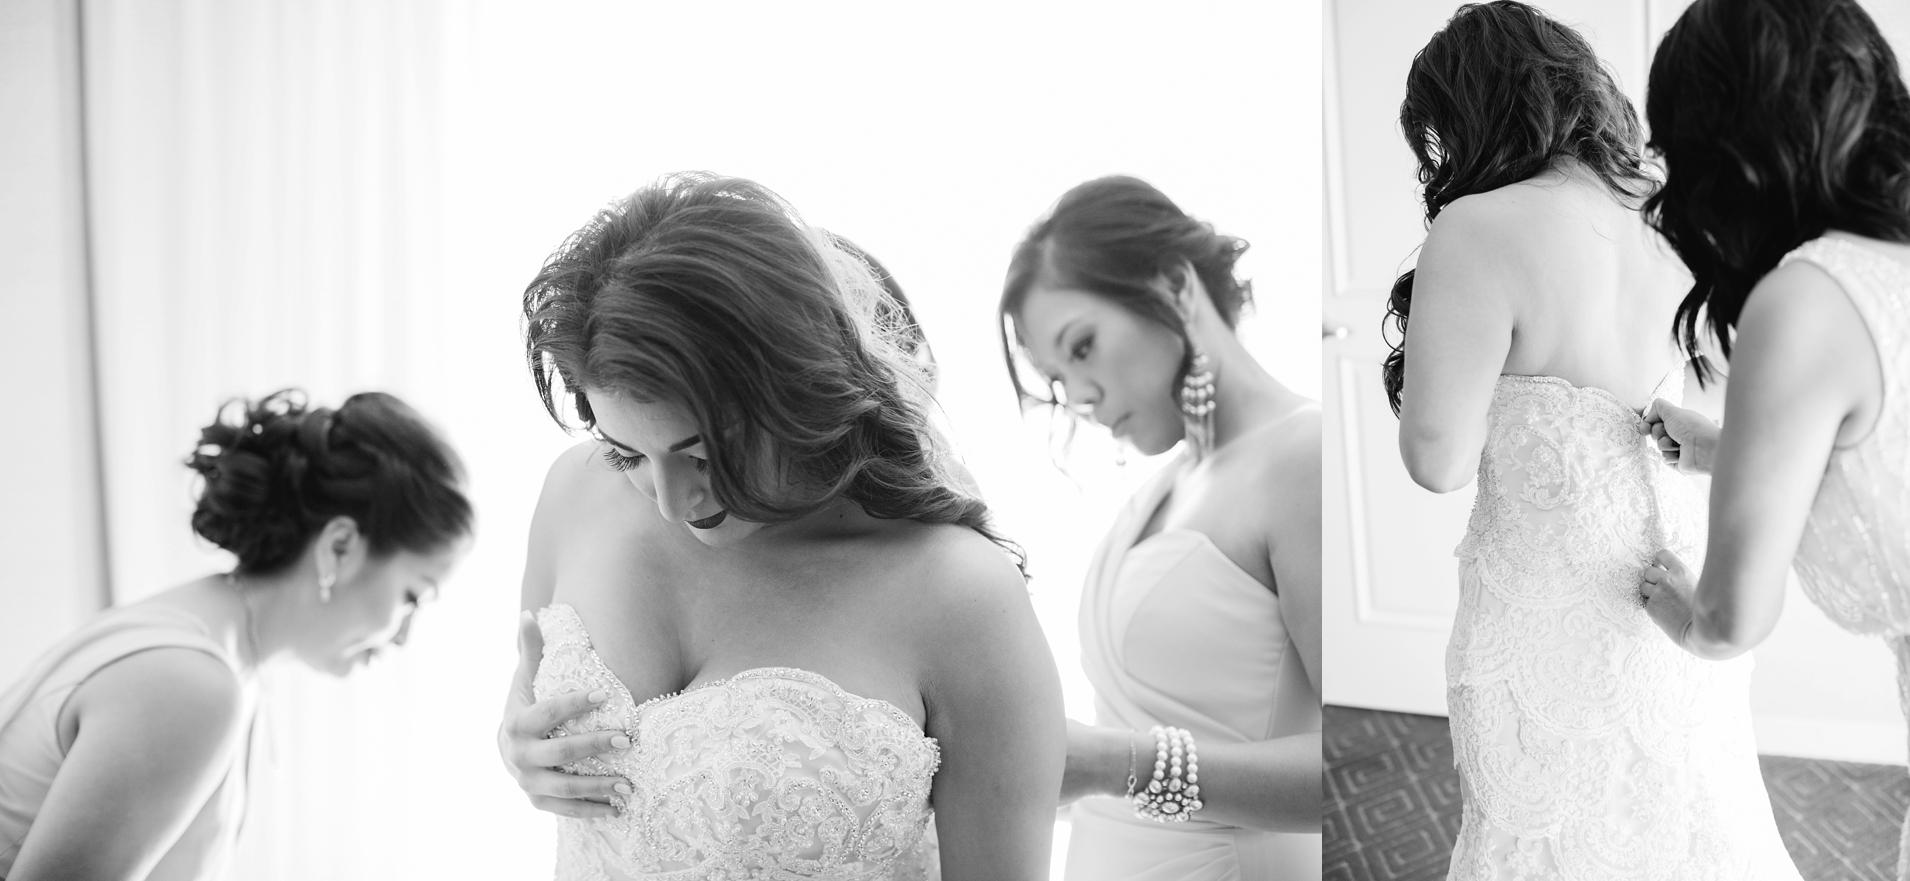 Bride getting into Wedding Dress - Brittney Hannon Photography